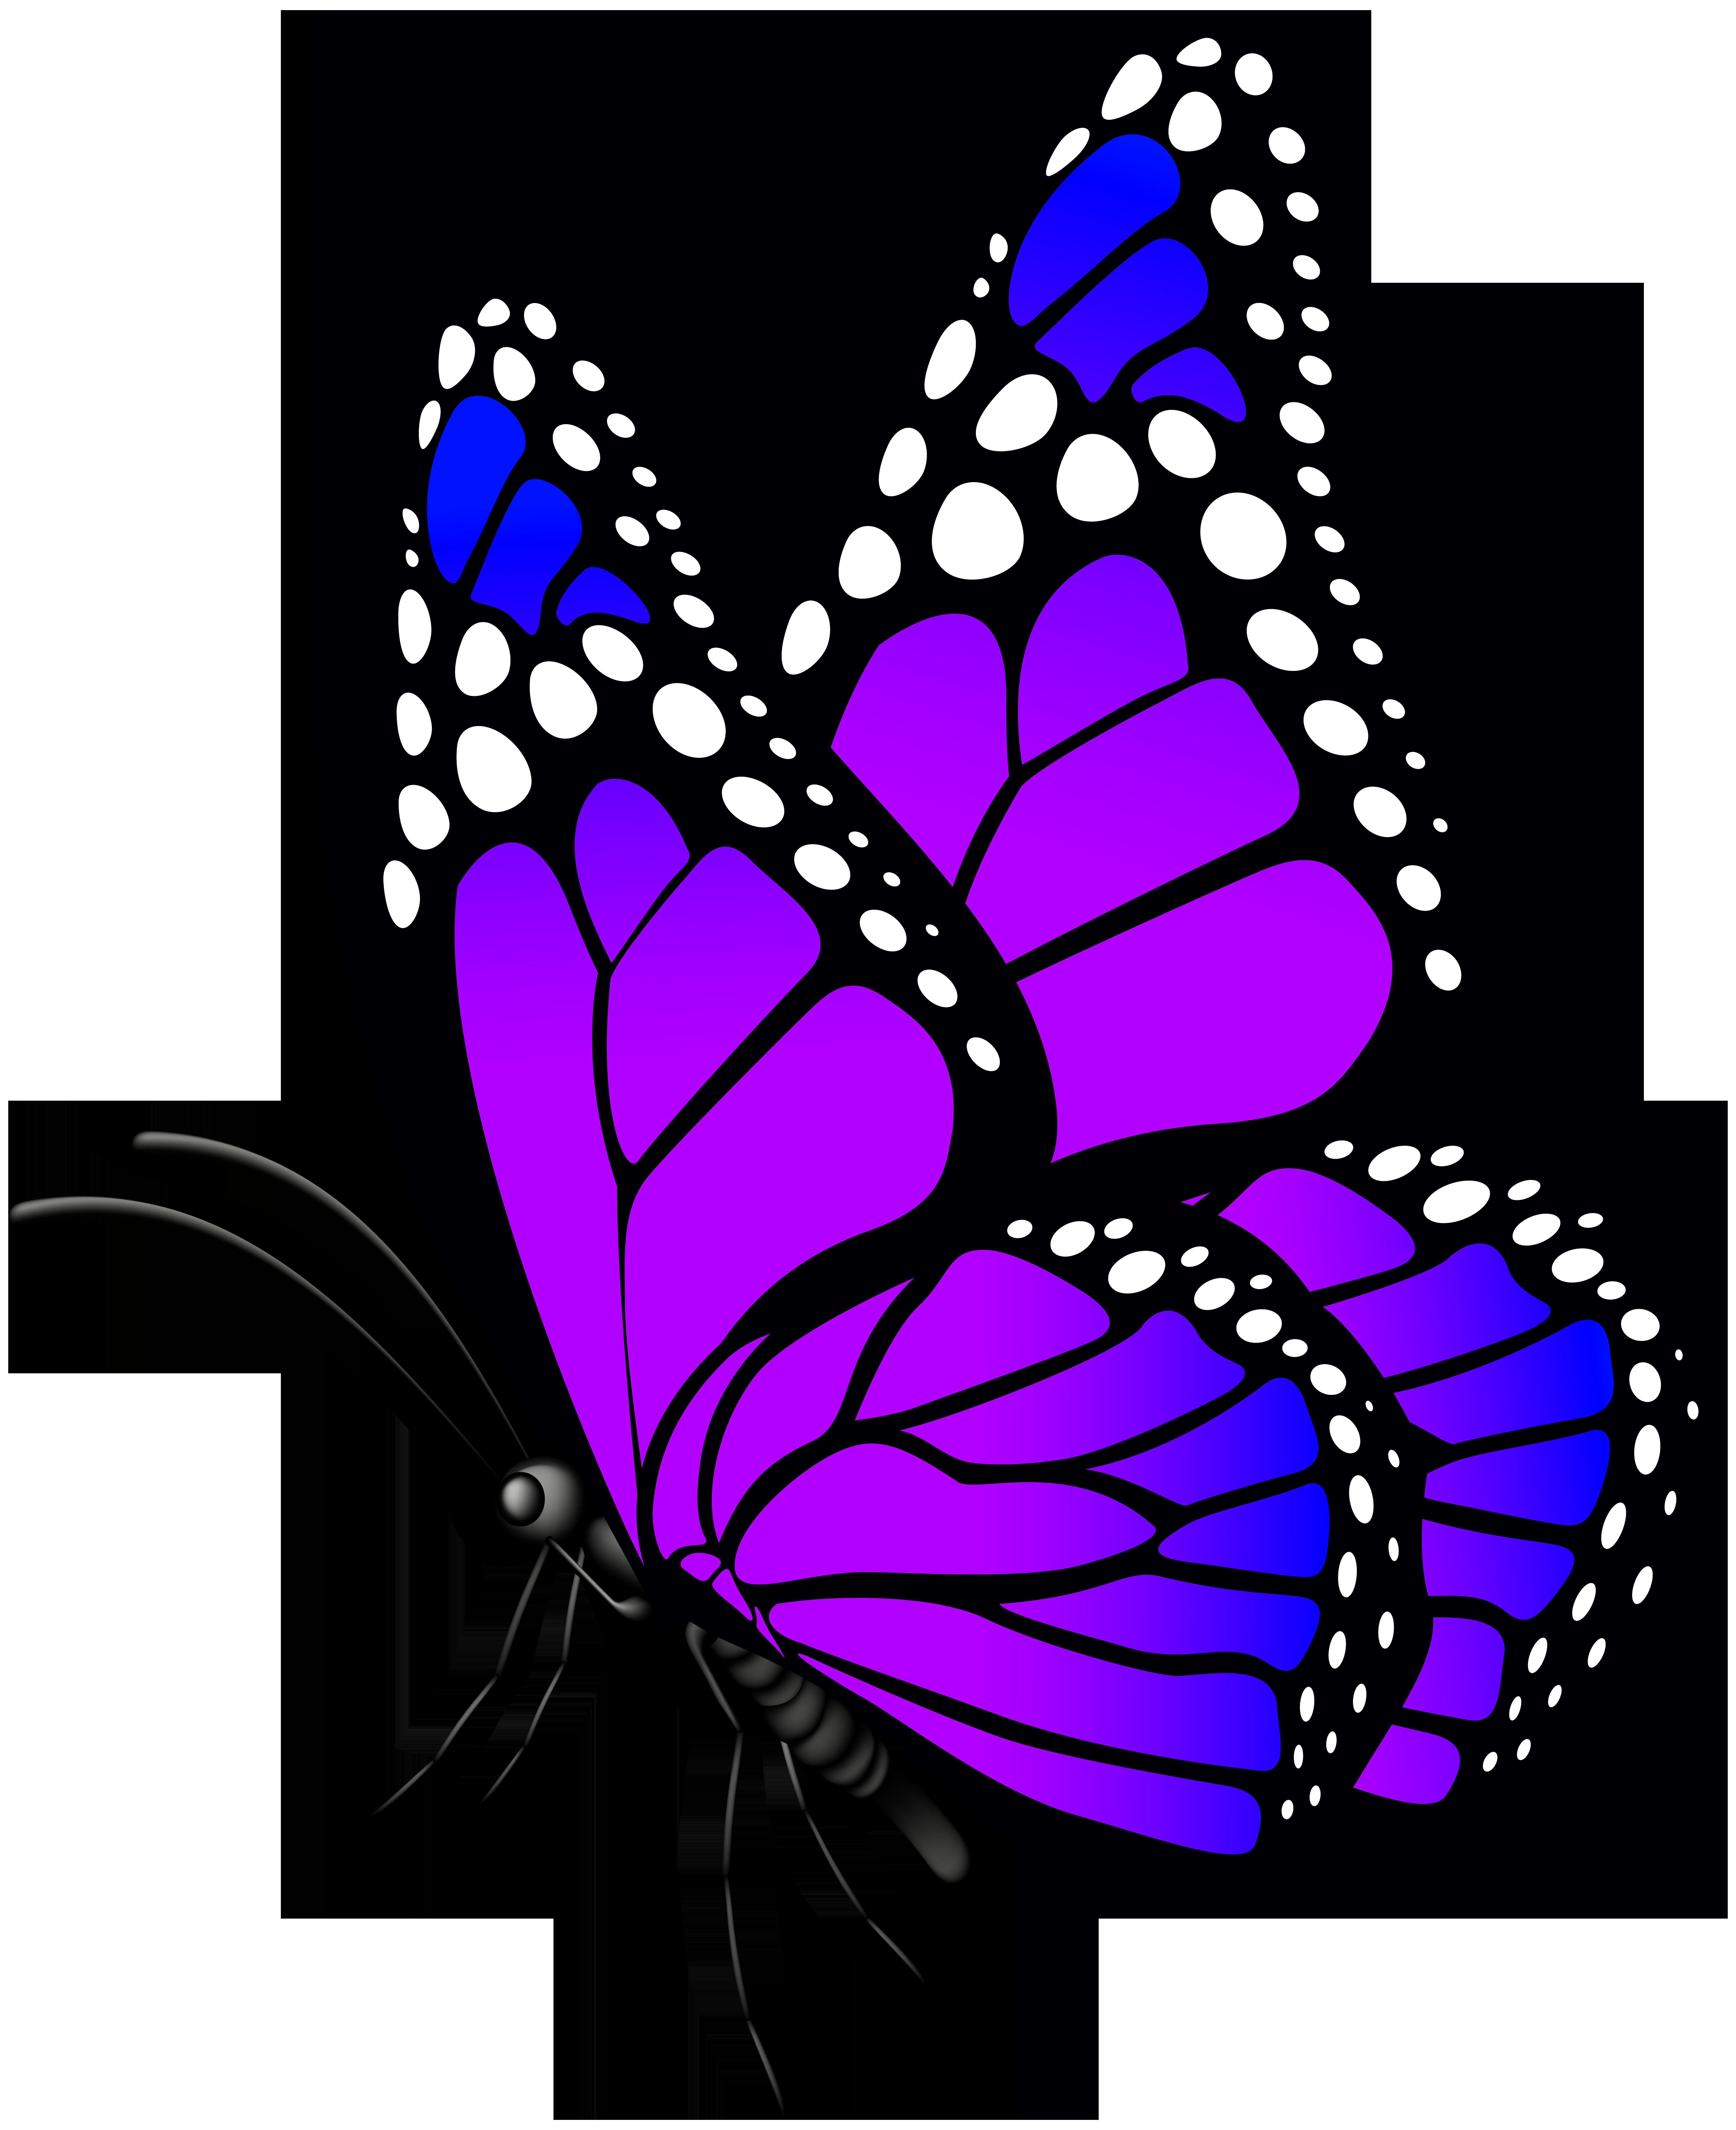 6521x8000 Butterfly Purple Png Clip Art Imageu200b Gallery Yopriceville